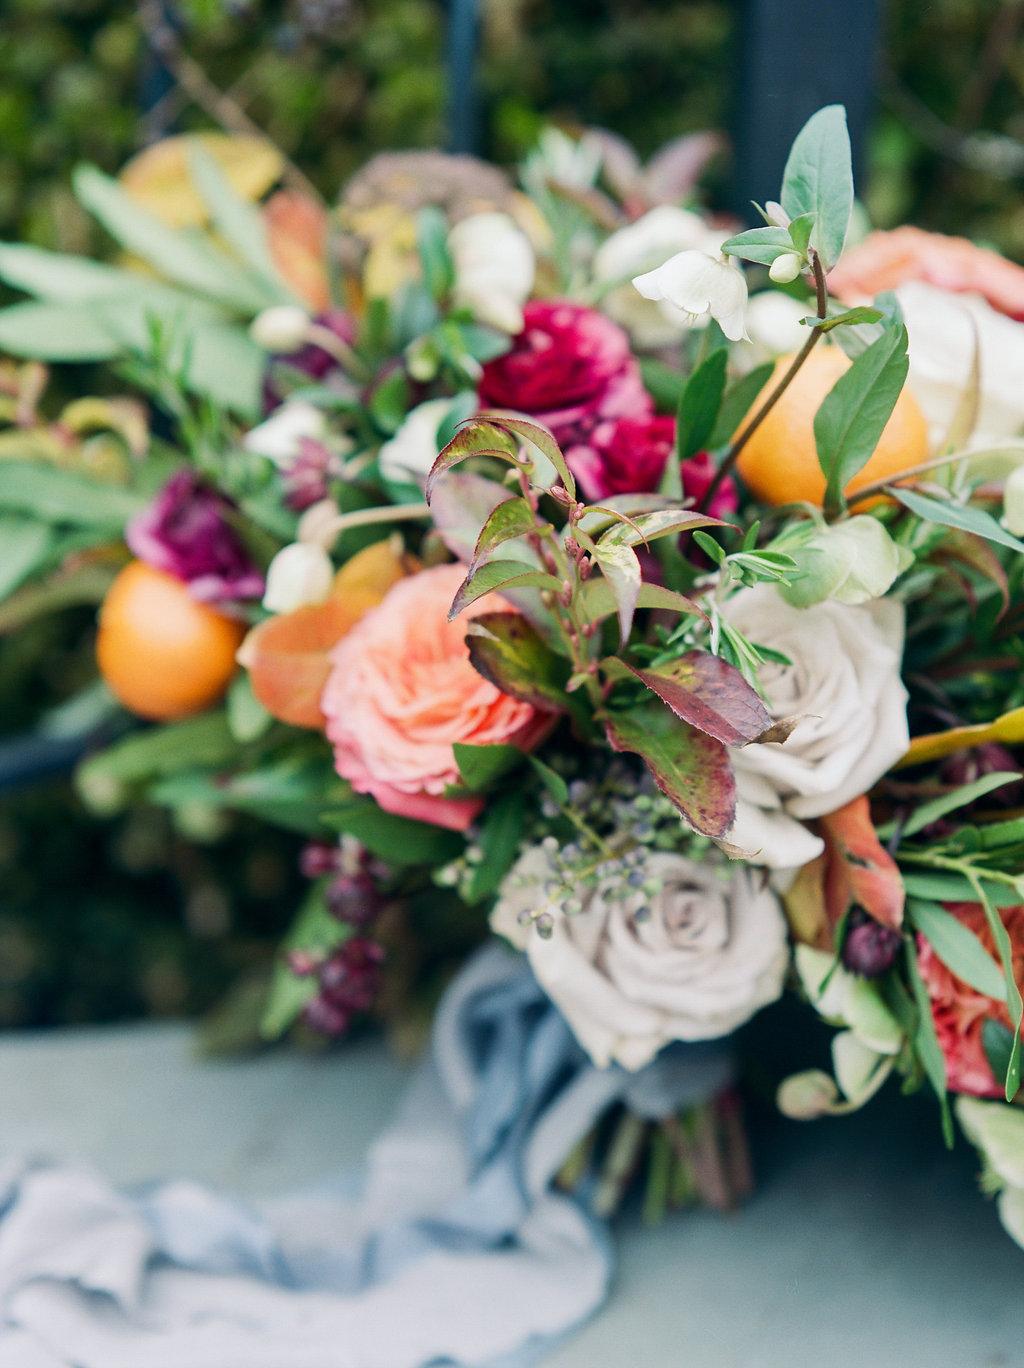 fall wedding flowers - photo by Lissa Ryan Photography http://ruffledblog.com/modern-romantic-wedding-ideas-with-family-heirlooms